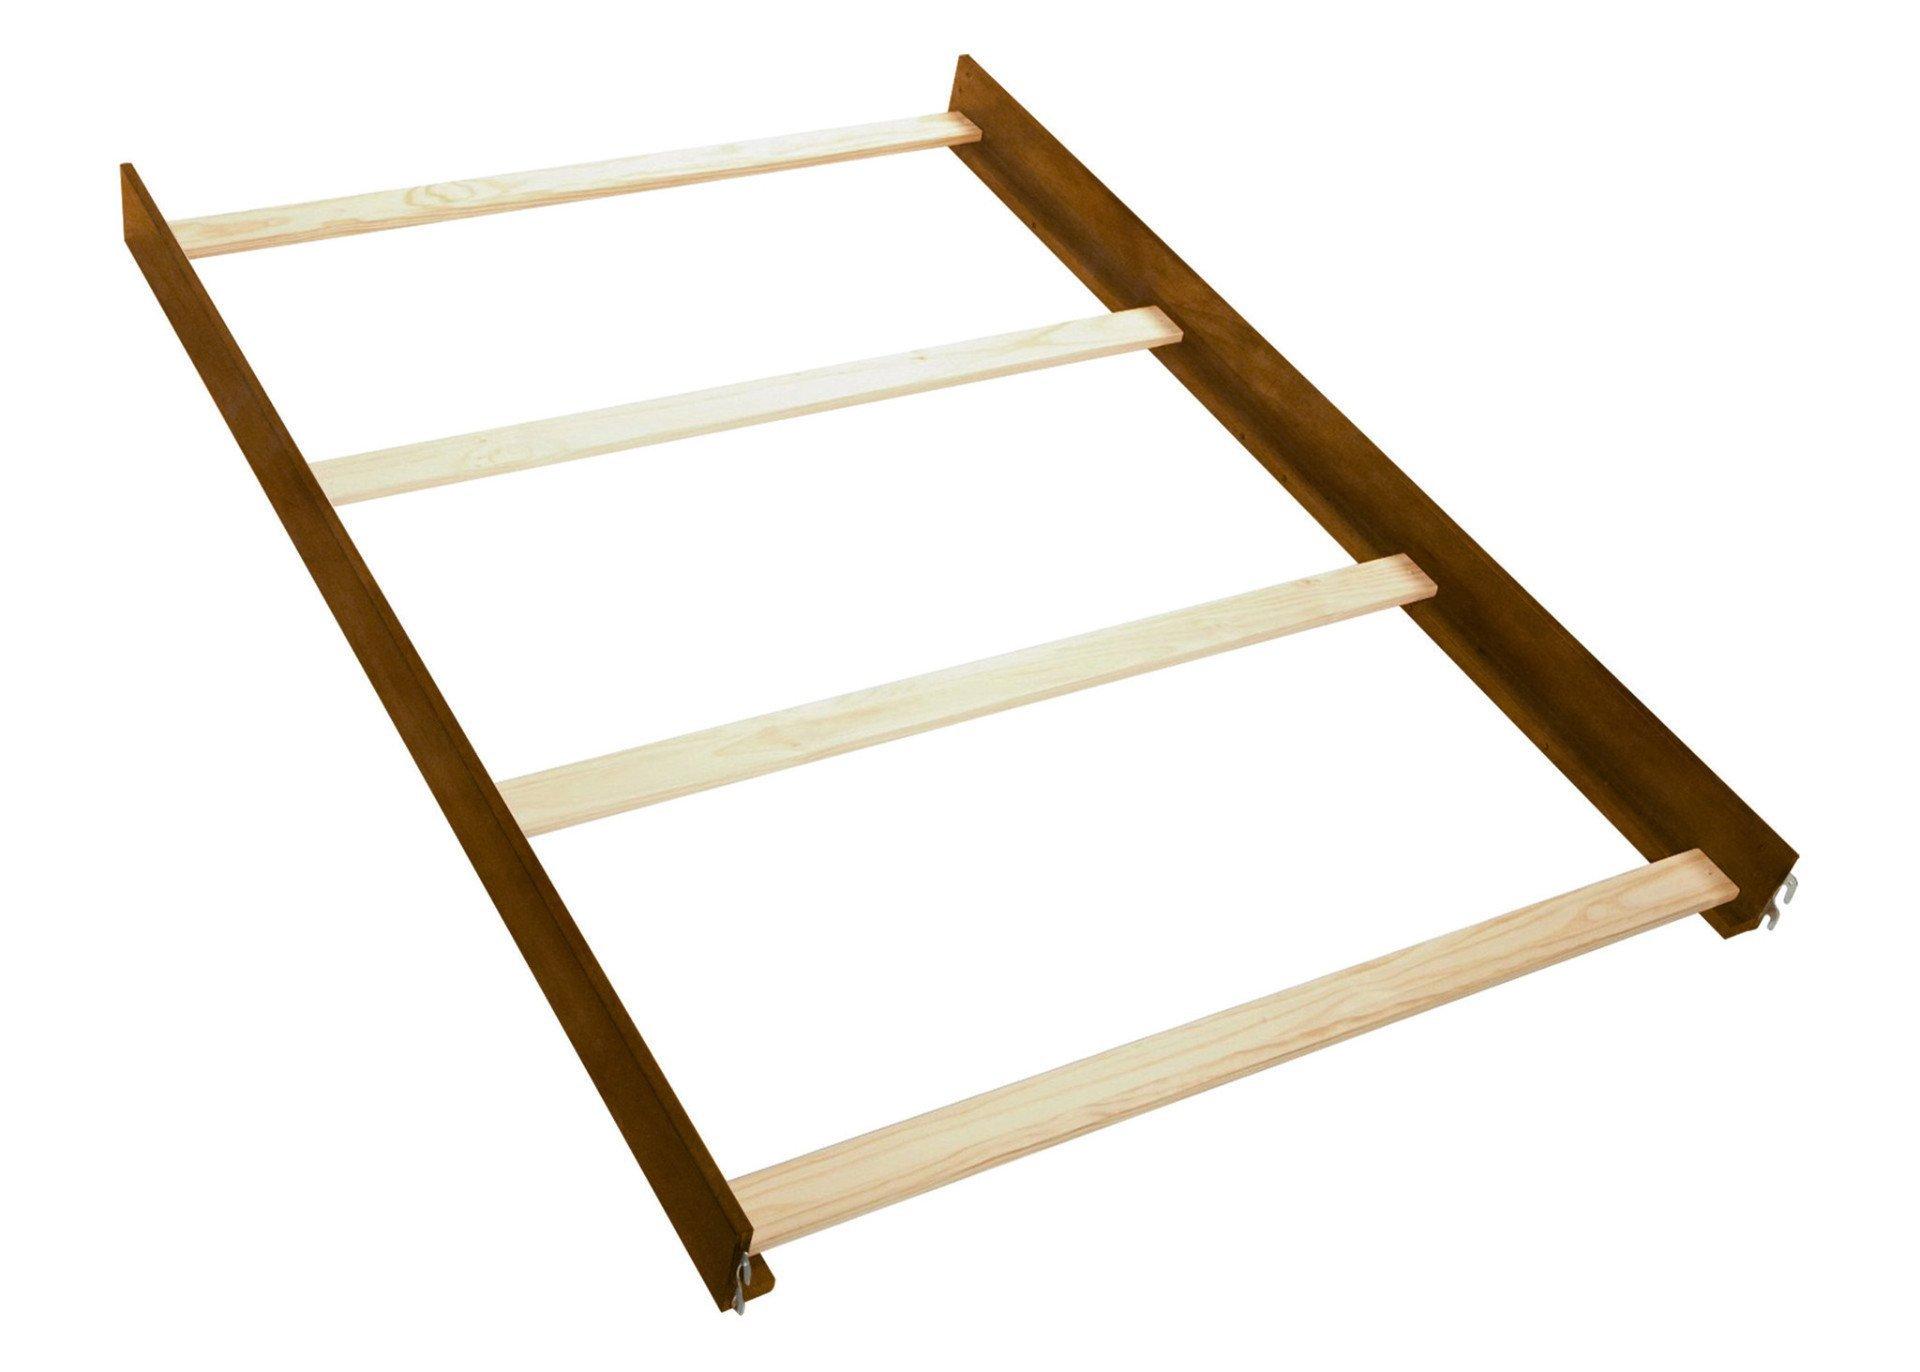 Lajobi Europa Baby Palisades Crib Full Size Conversion Kit Bed Rails - Harvest Oak